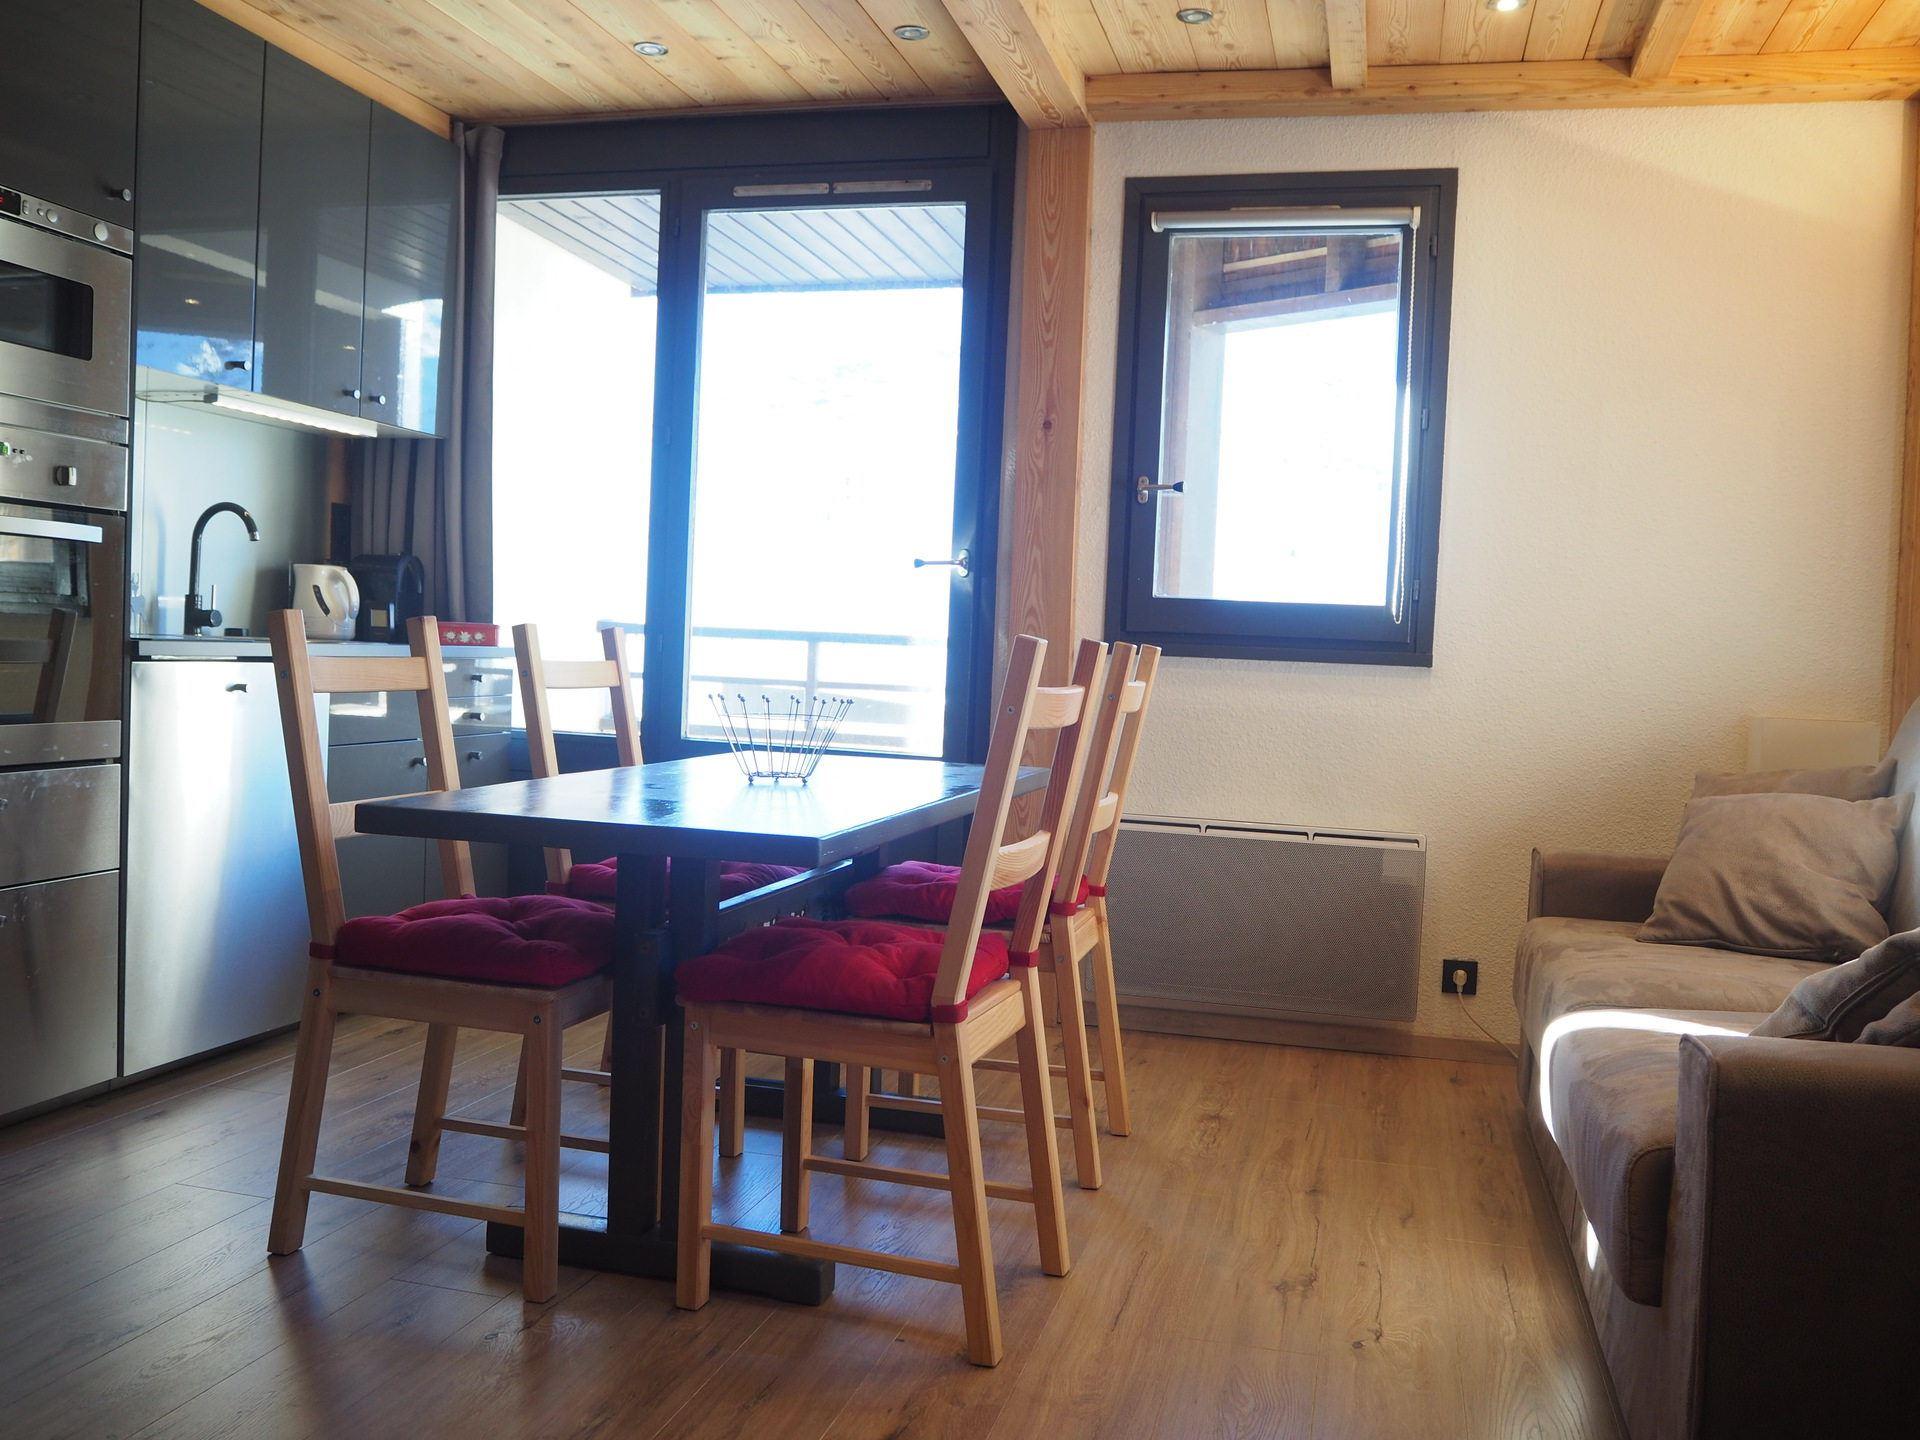 4 Pers Studio ski-in ski-out / GENTIANES 412